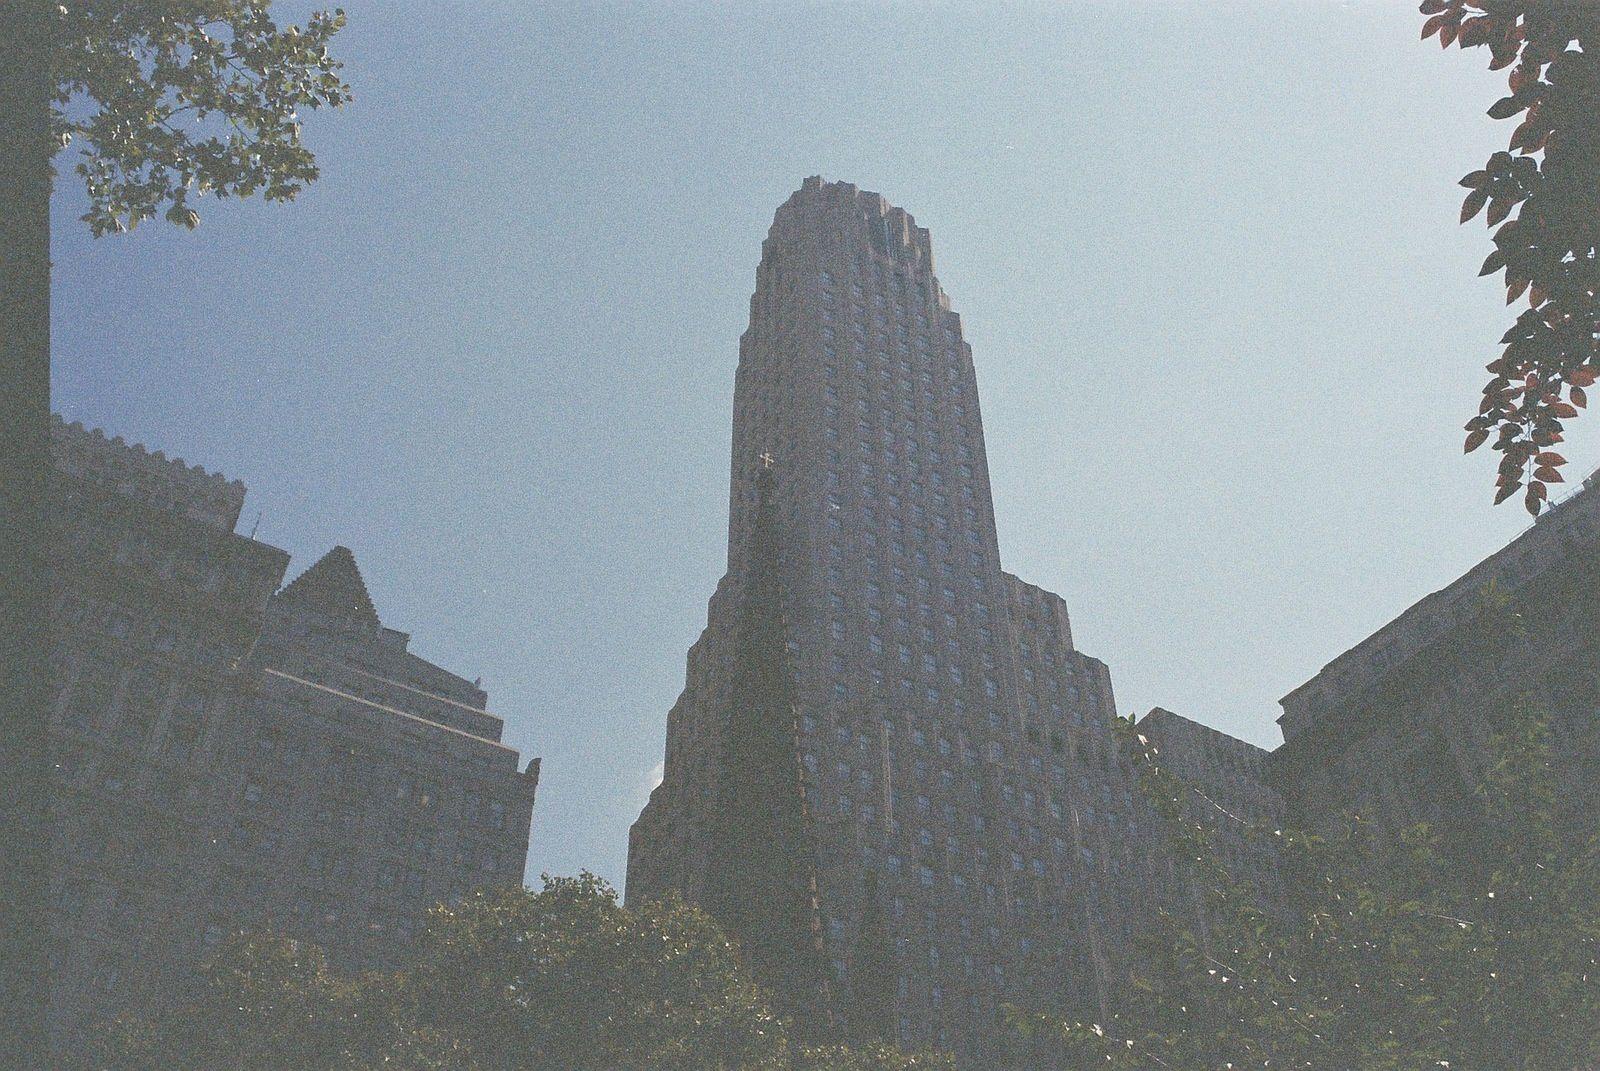 New York en argentique, USA - Août 2014